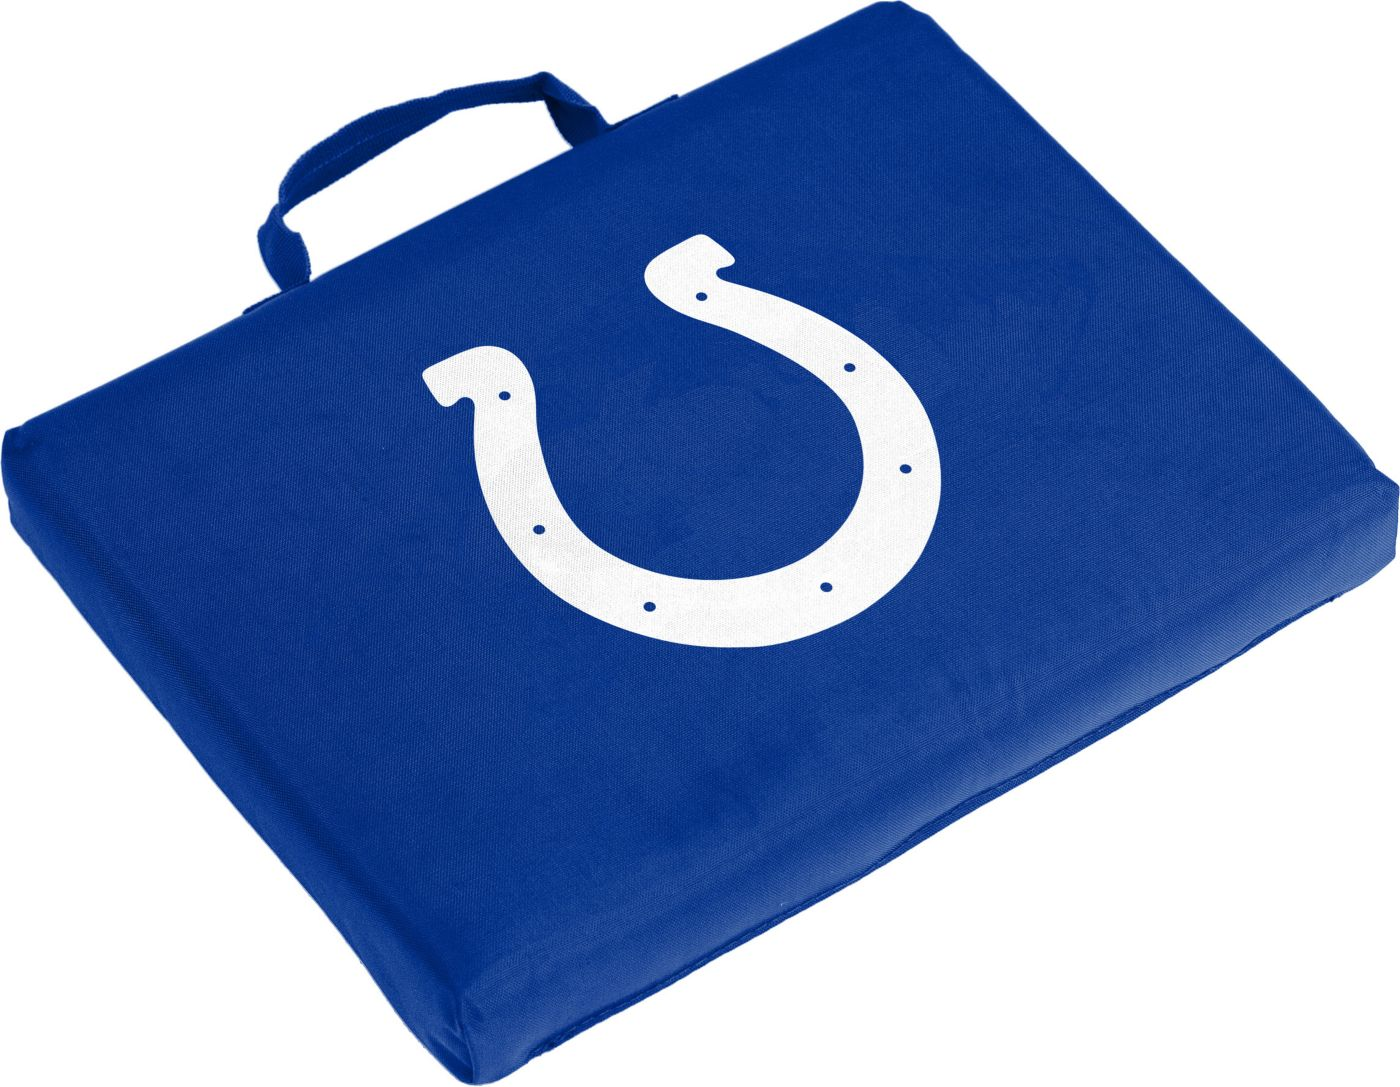 Indianapolis Colts Bleacher Seat Cushion